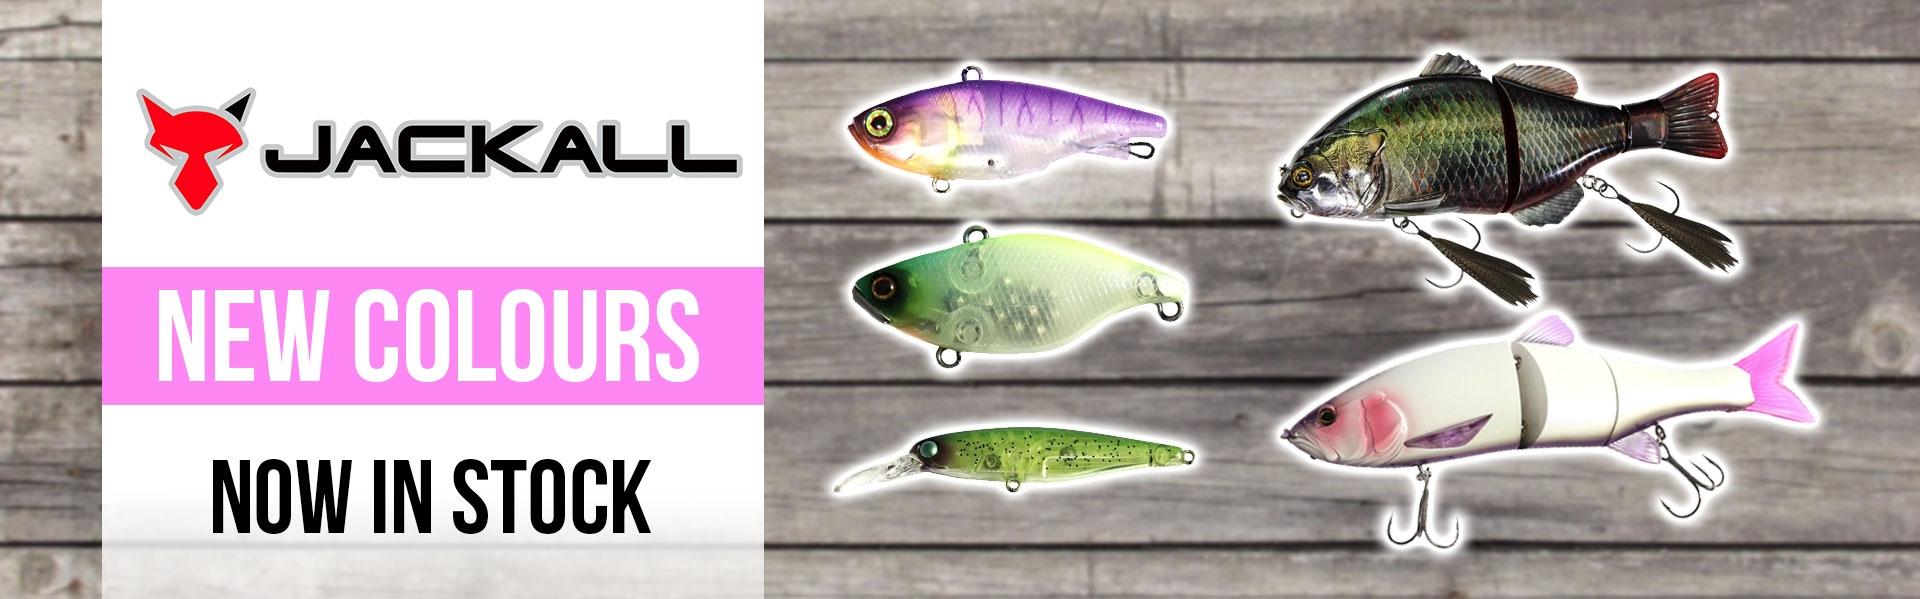 New Jackall Colours